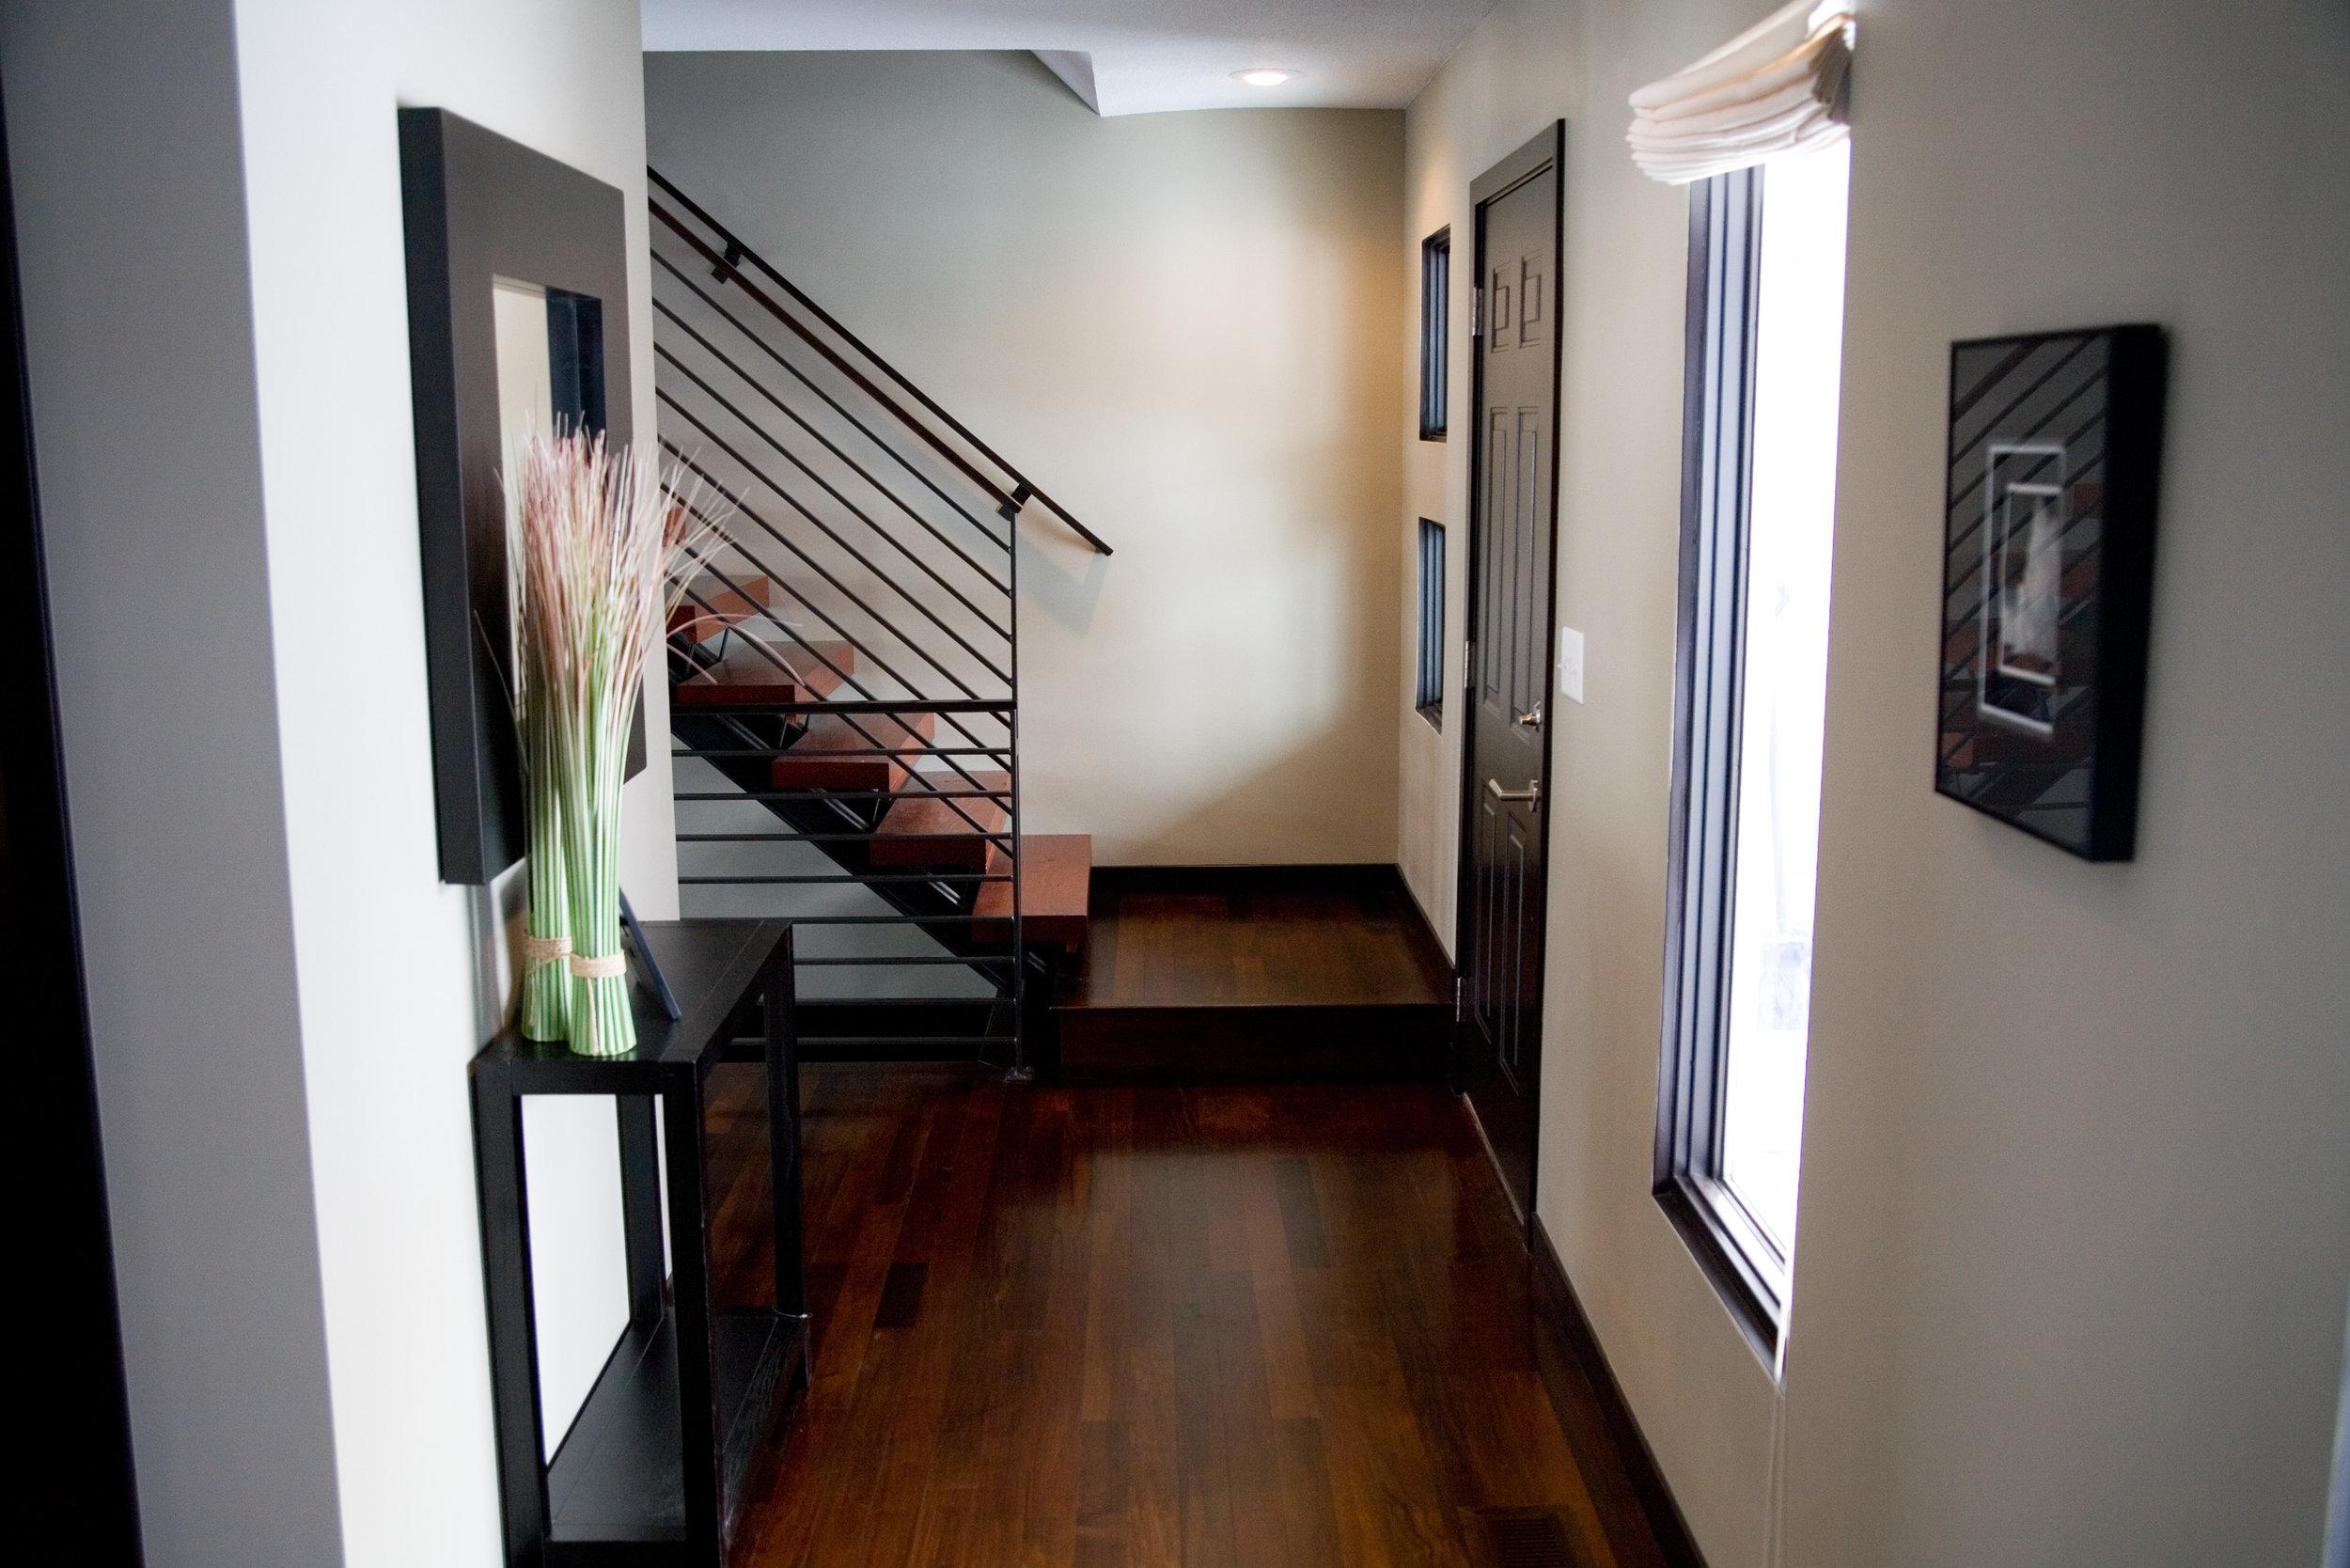 glen-oaks-basement-a-400.jpg